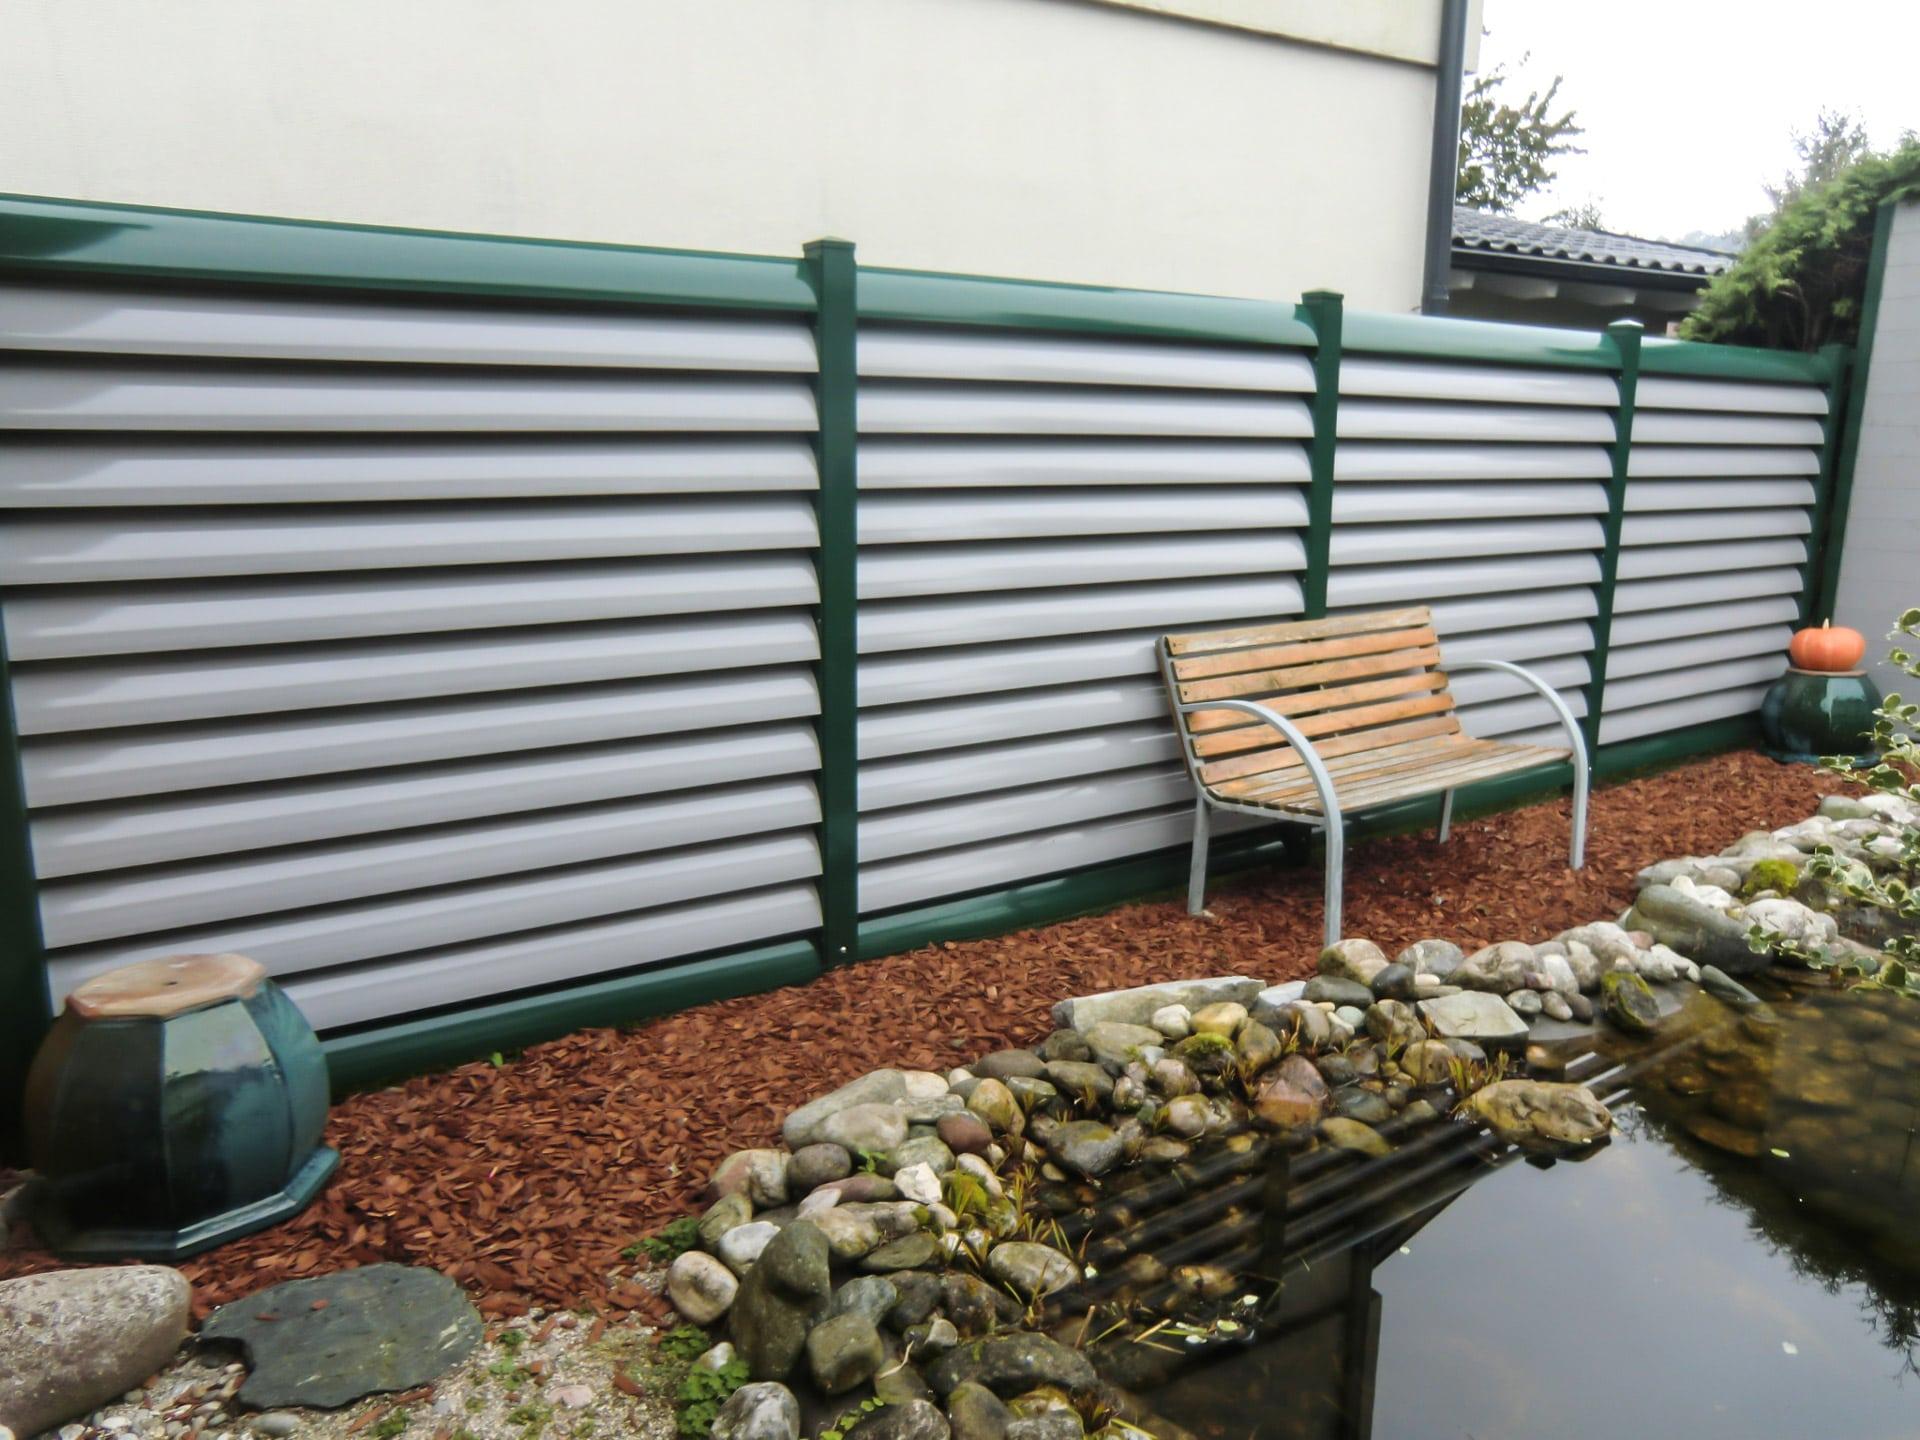 ZA Bad Ischl 04 b | Sichtschutzzaun aus Aluminium-Lamellen moosgrün-hellgrau beschichtet | Svoboda